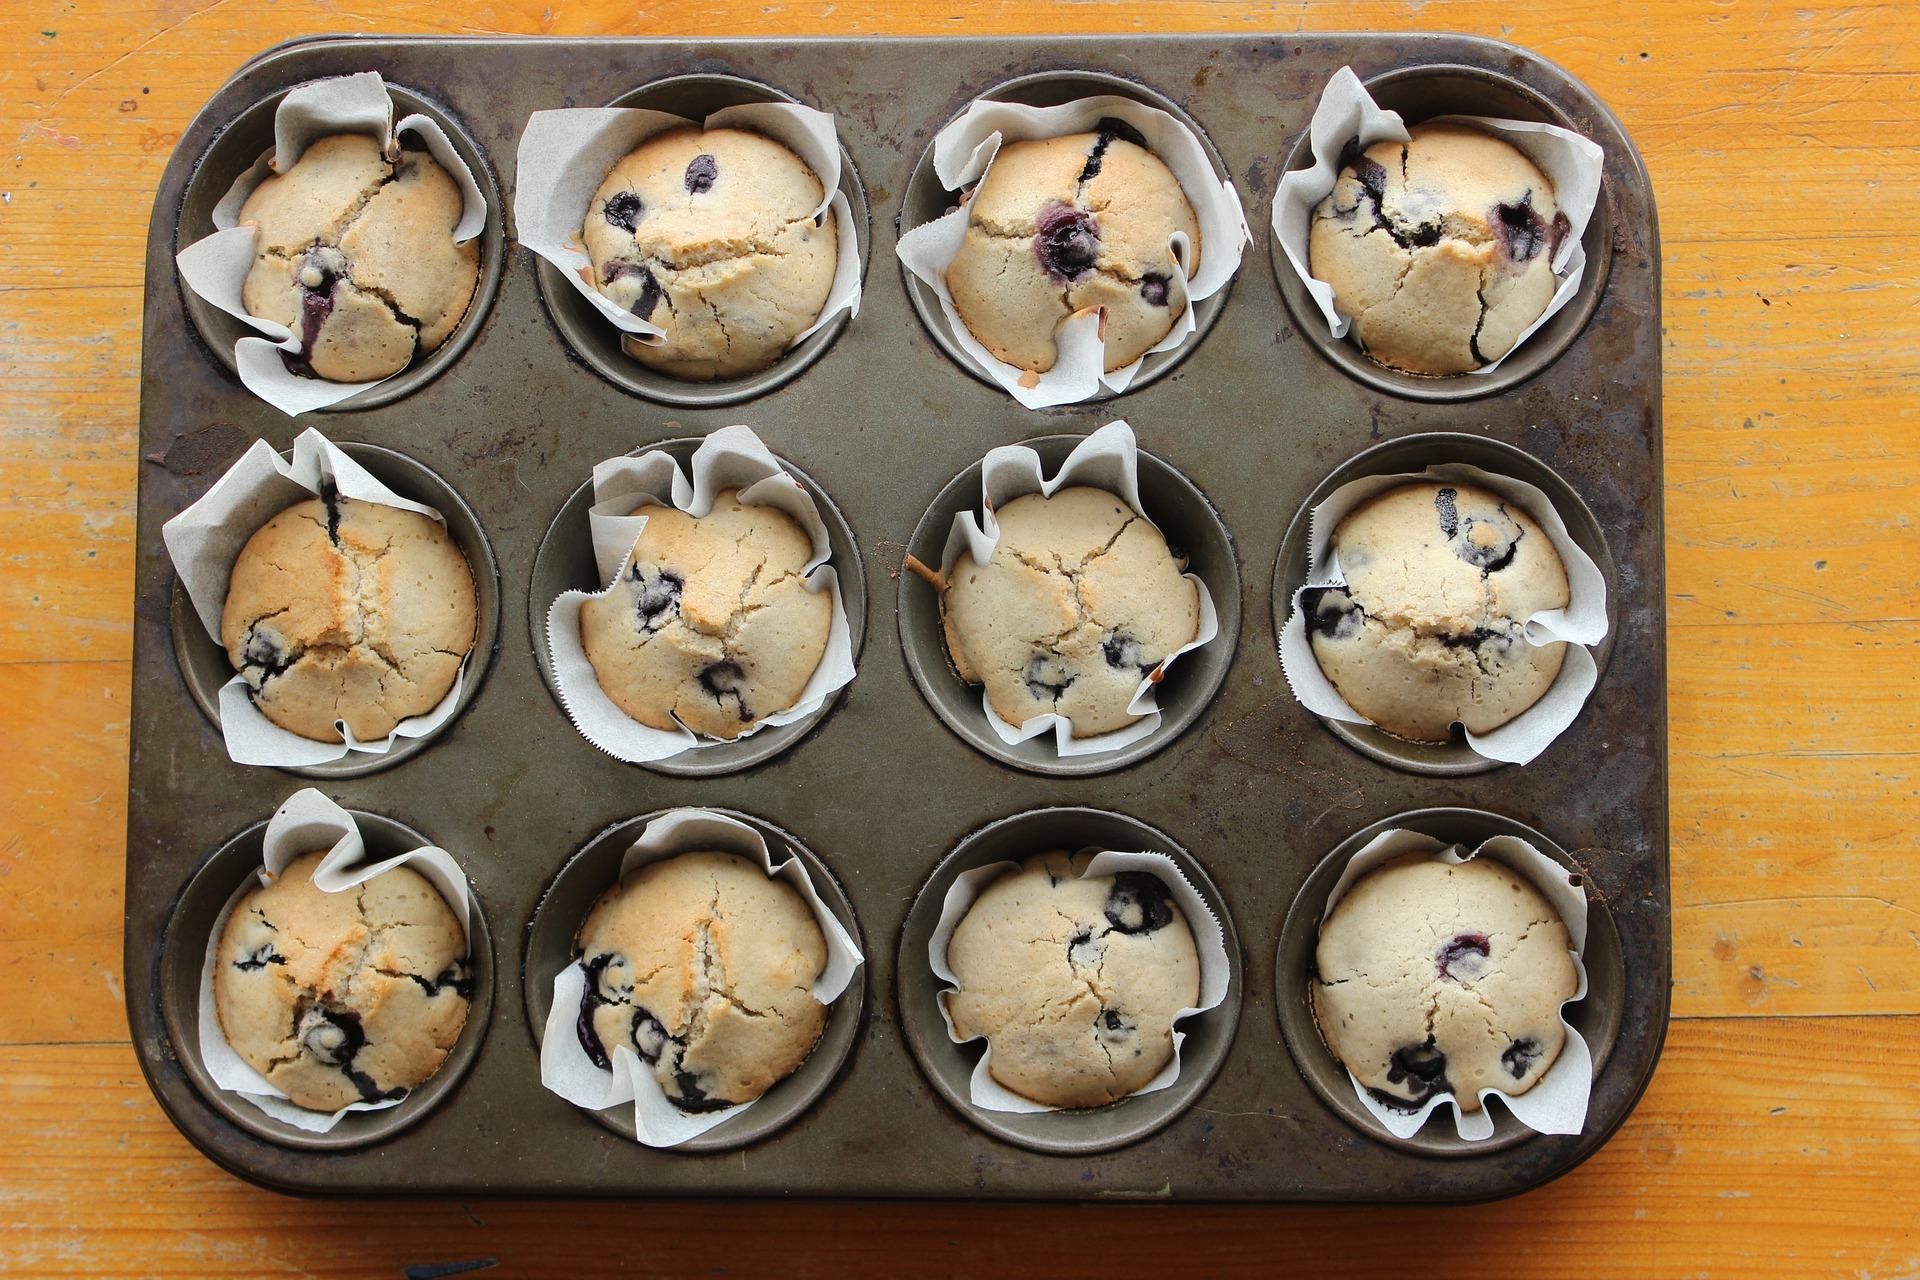 muffins-1047049_1920